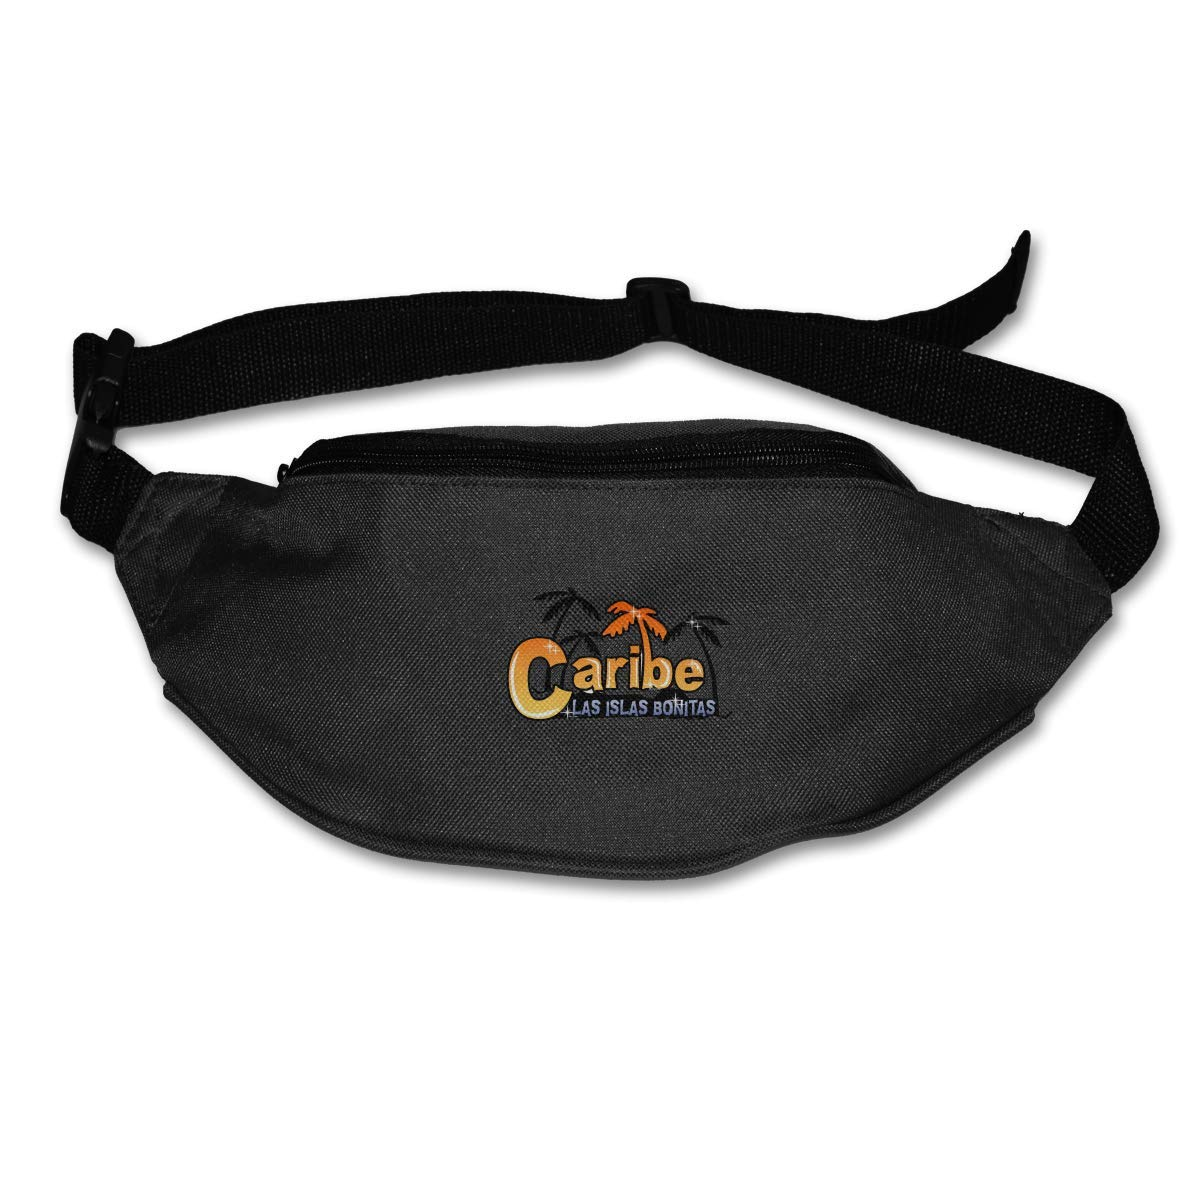 Caribe Las Islas Bonitas Canvas Running Waist Pack Bag Travel Sports